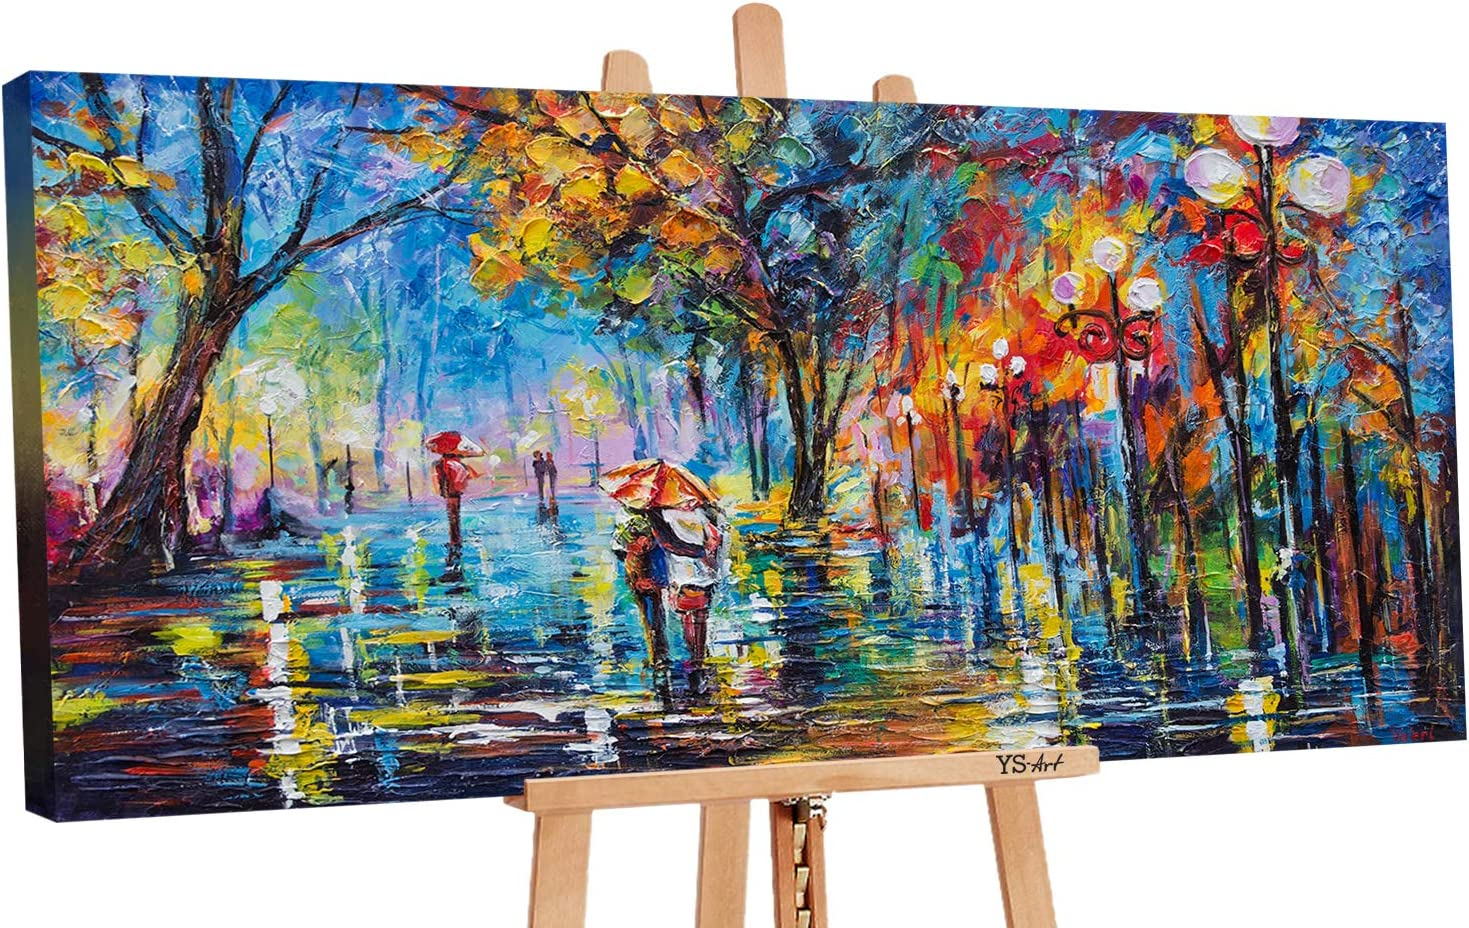 100/% Handgemalt Acryl Gemälde handgemaltes Wand Bild Kunst Leinwand Romanze